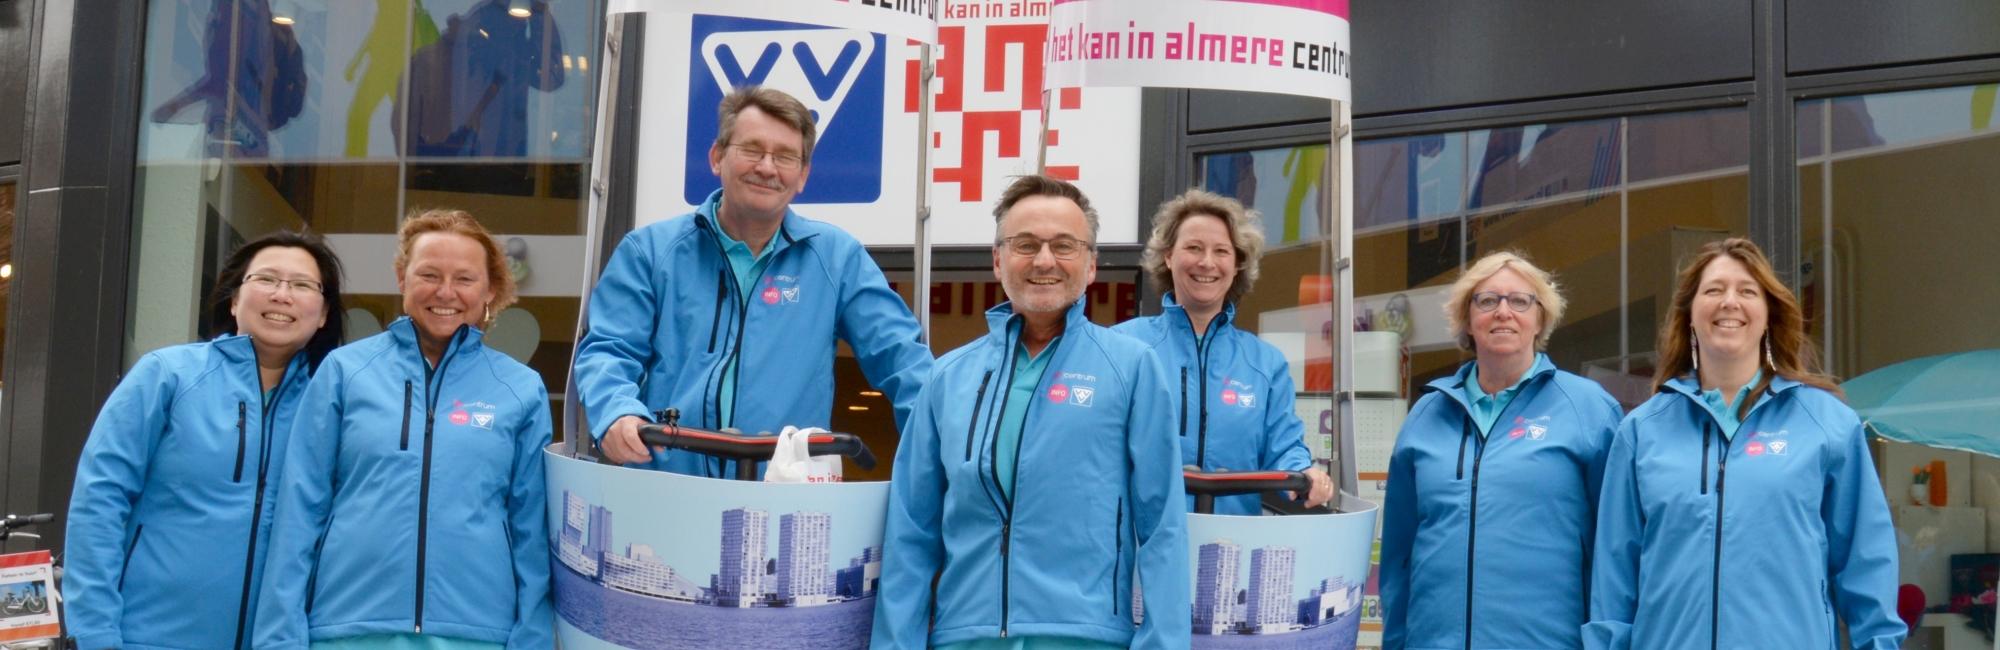 offline-promotie-vvv-almere